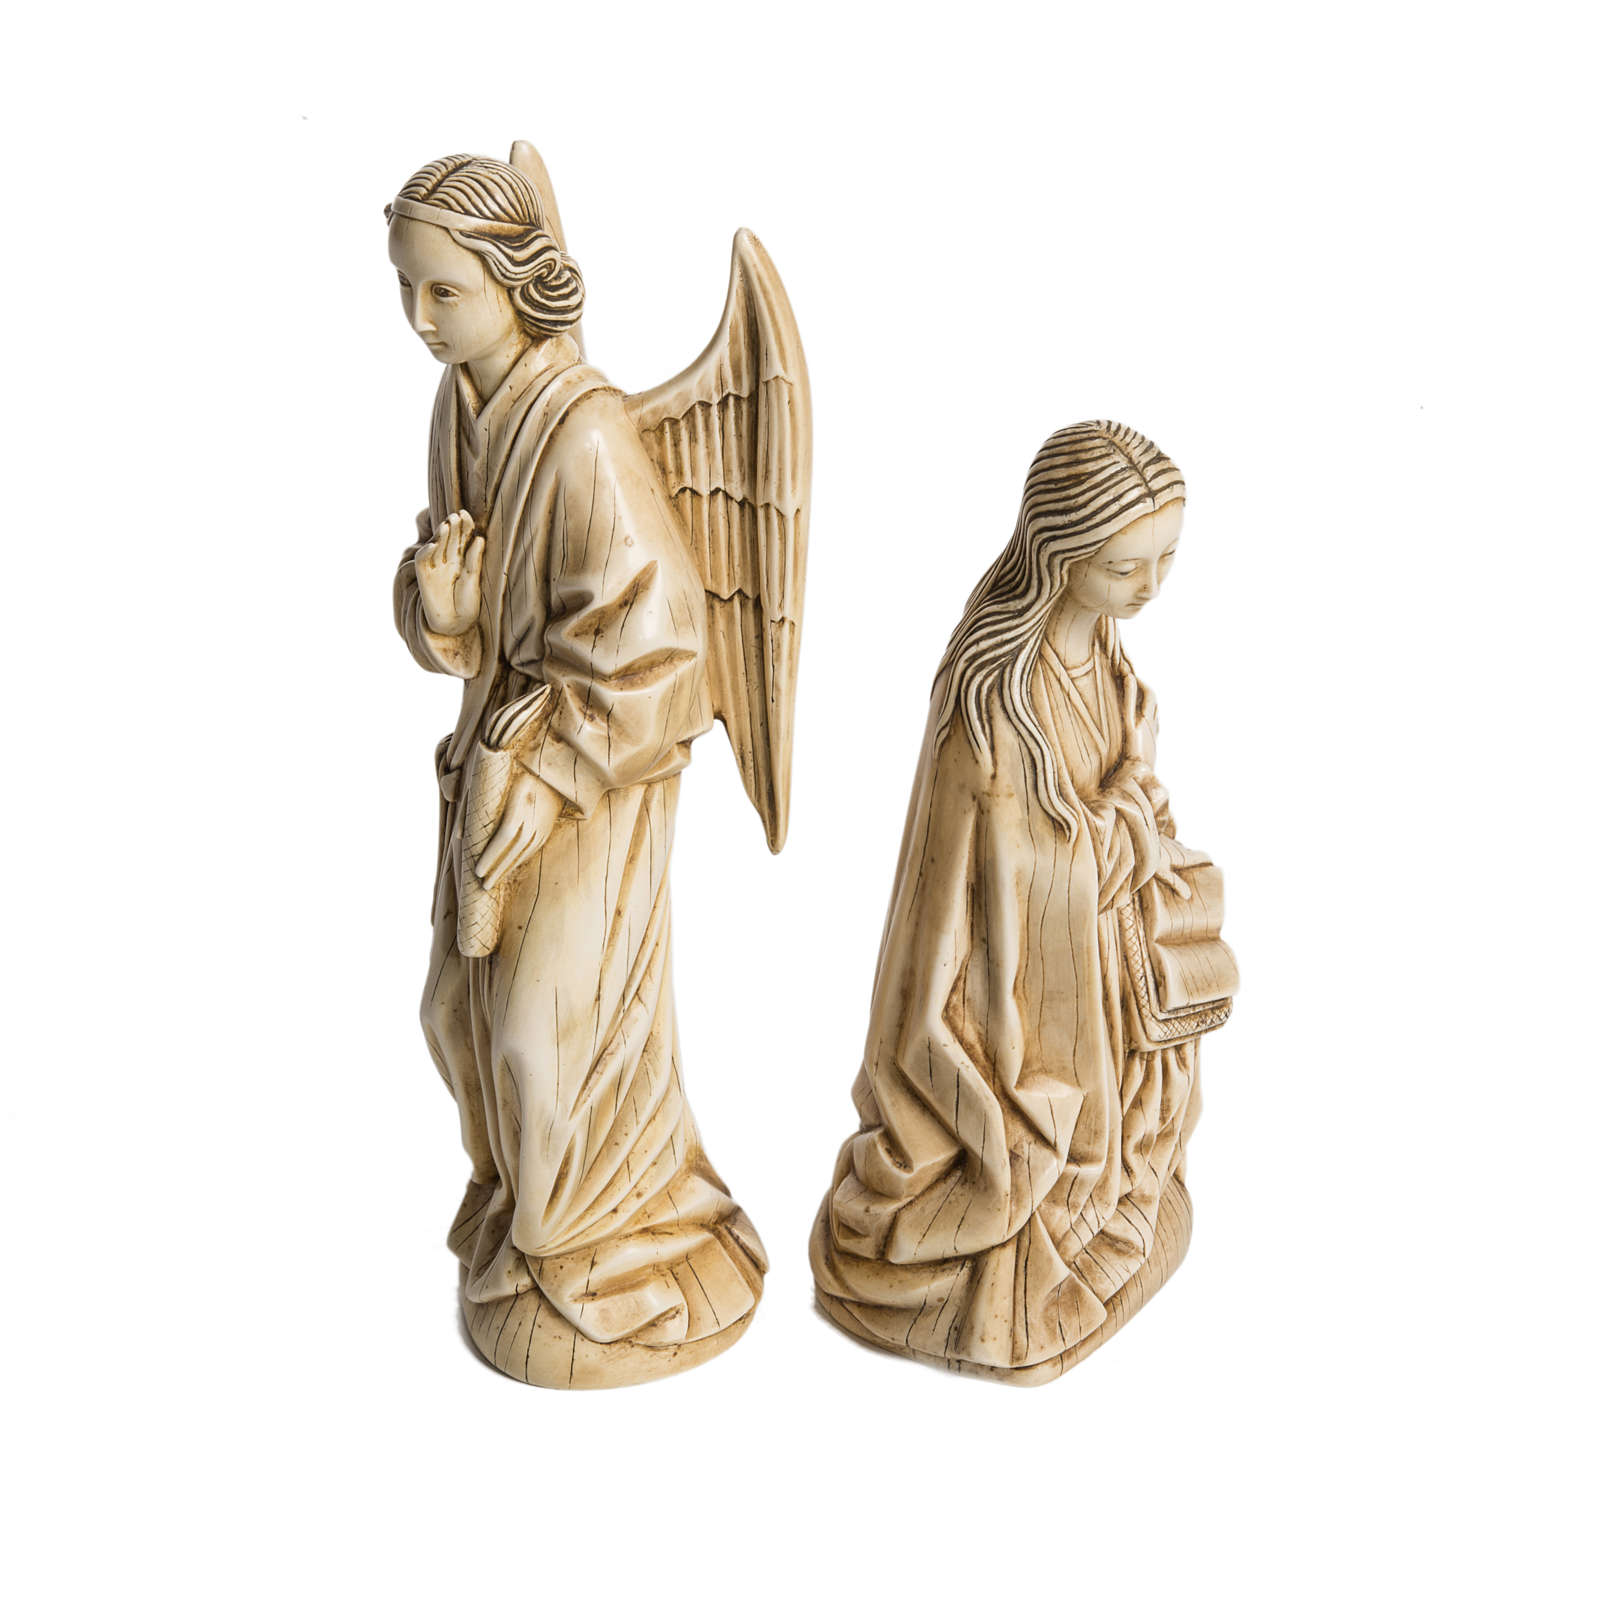 Annunciation stone statues 29 cm, Bethlehem Nuns 4